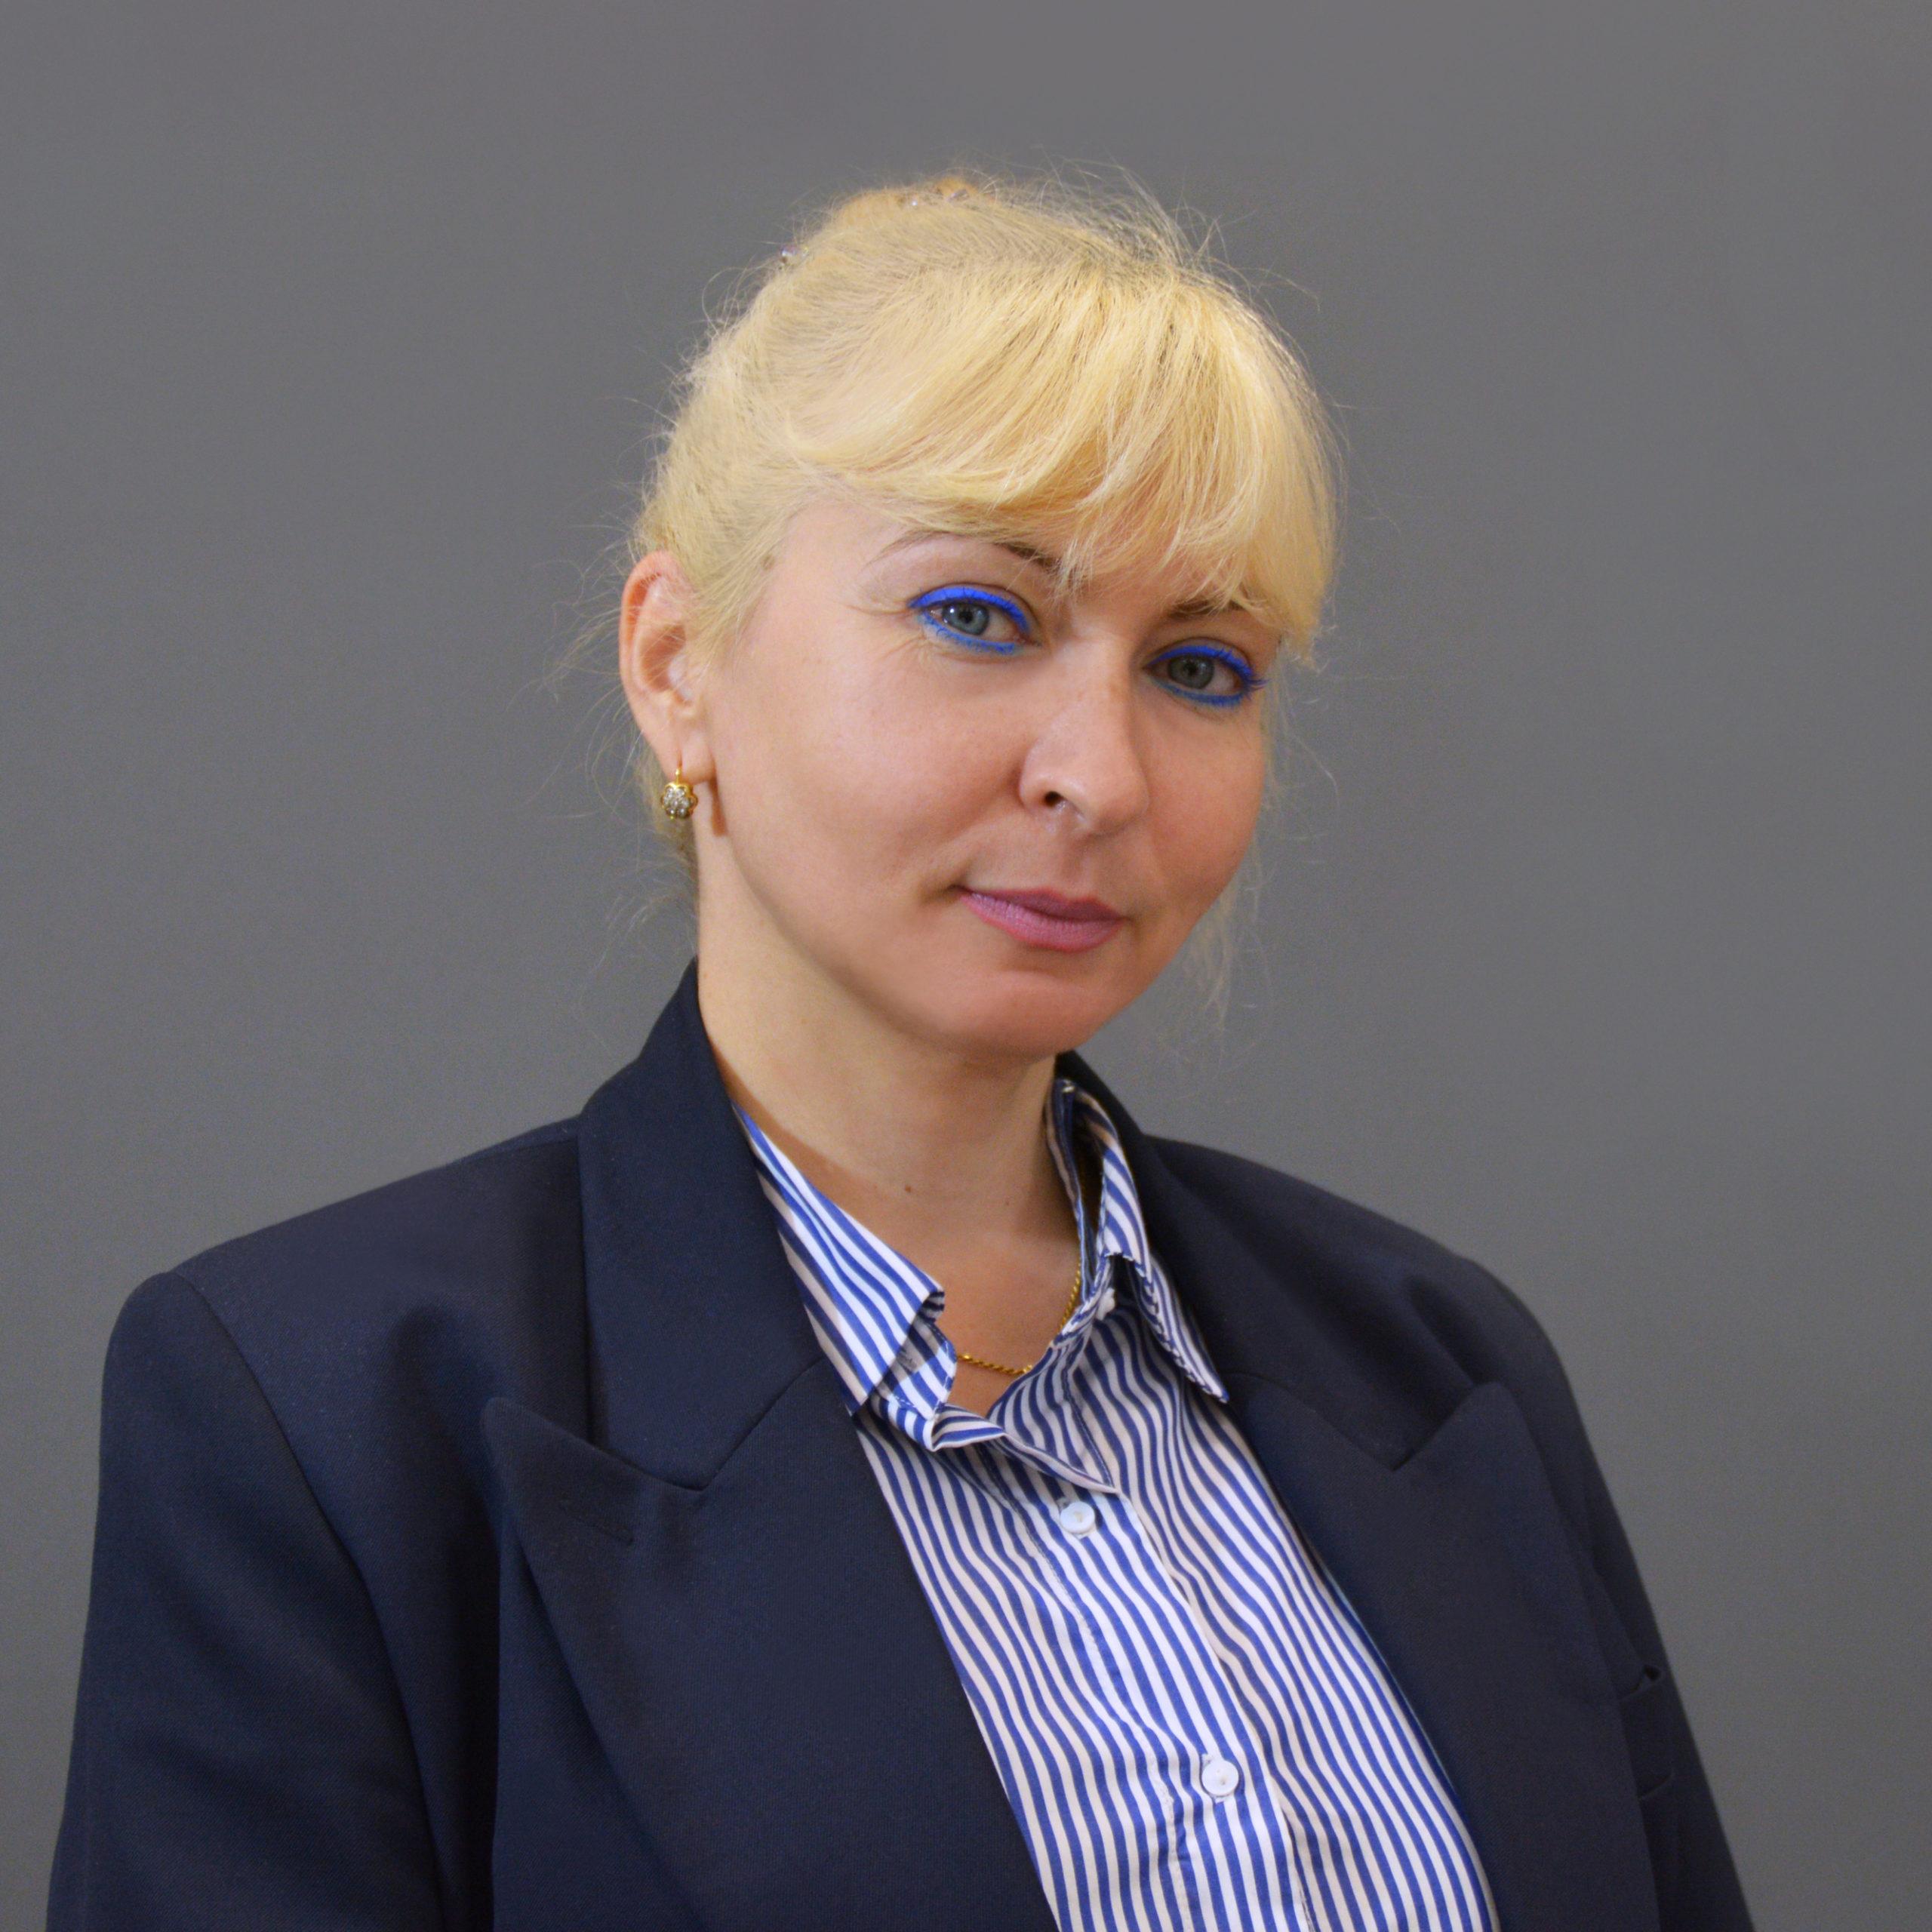 Золотарева Виктория Владимировна